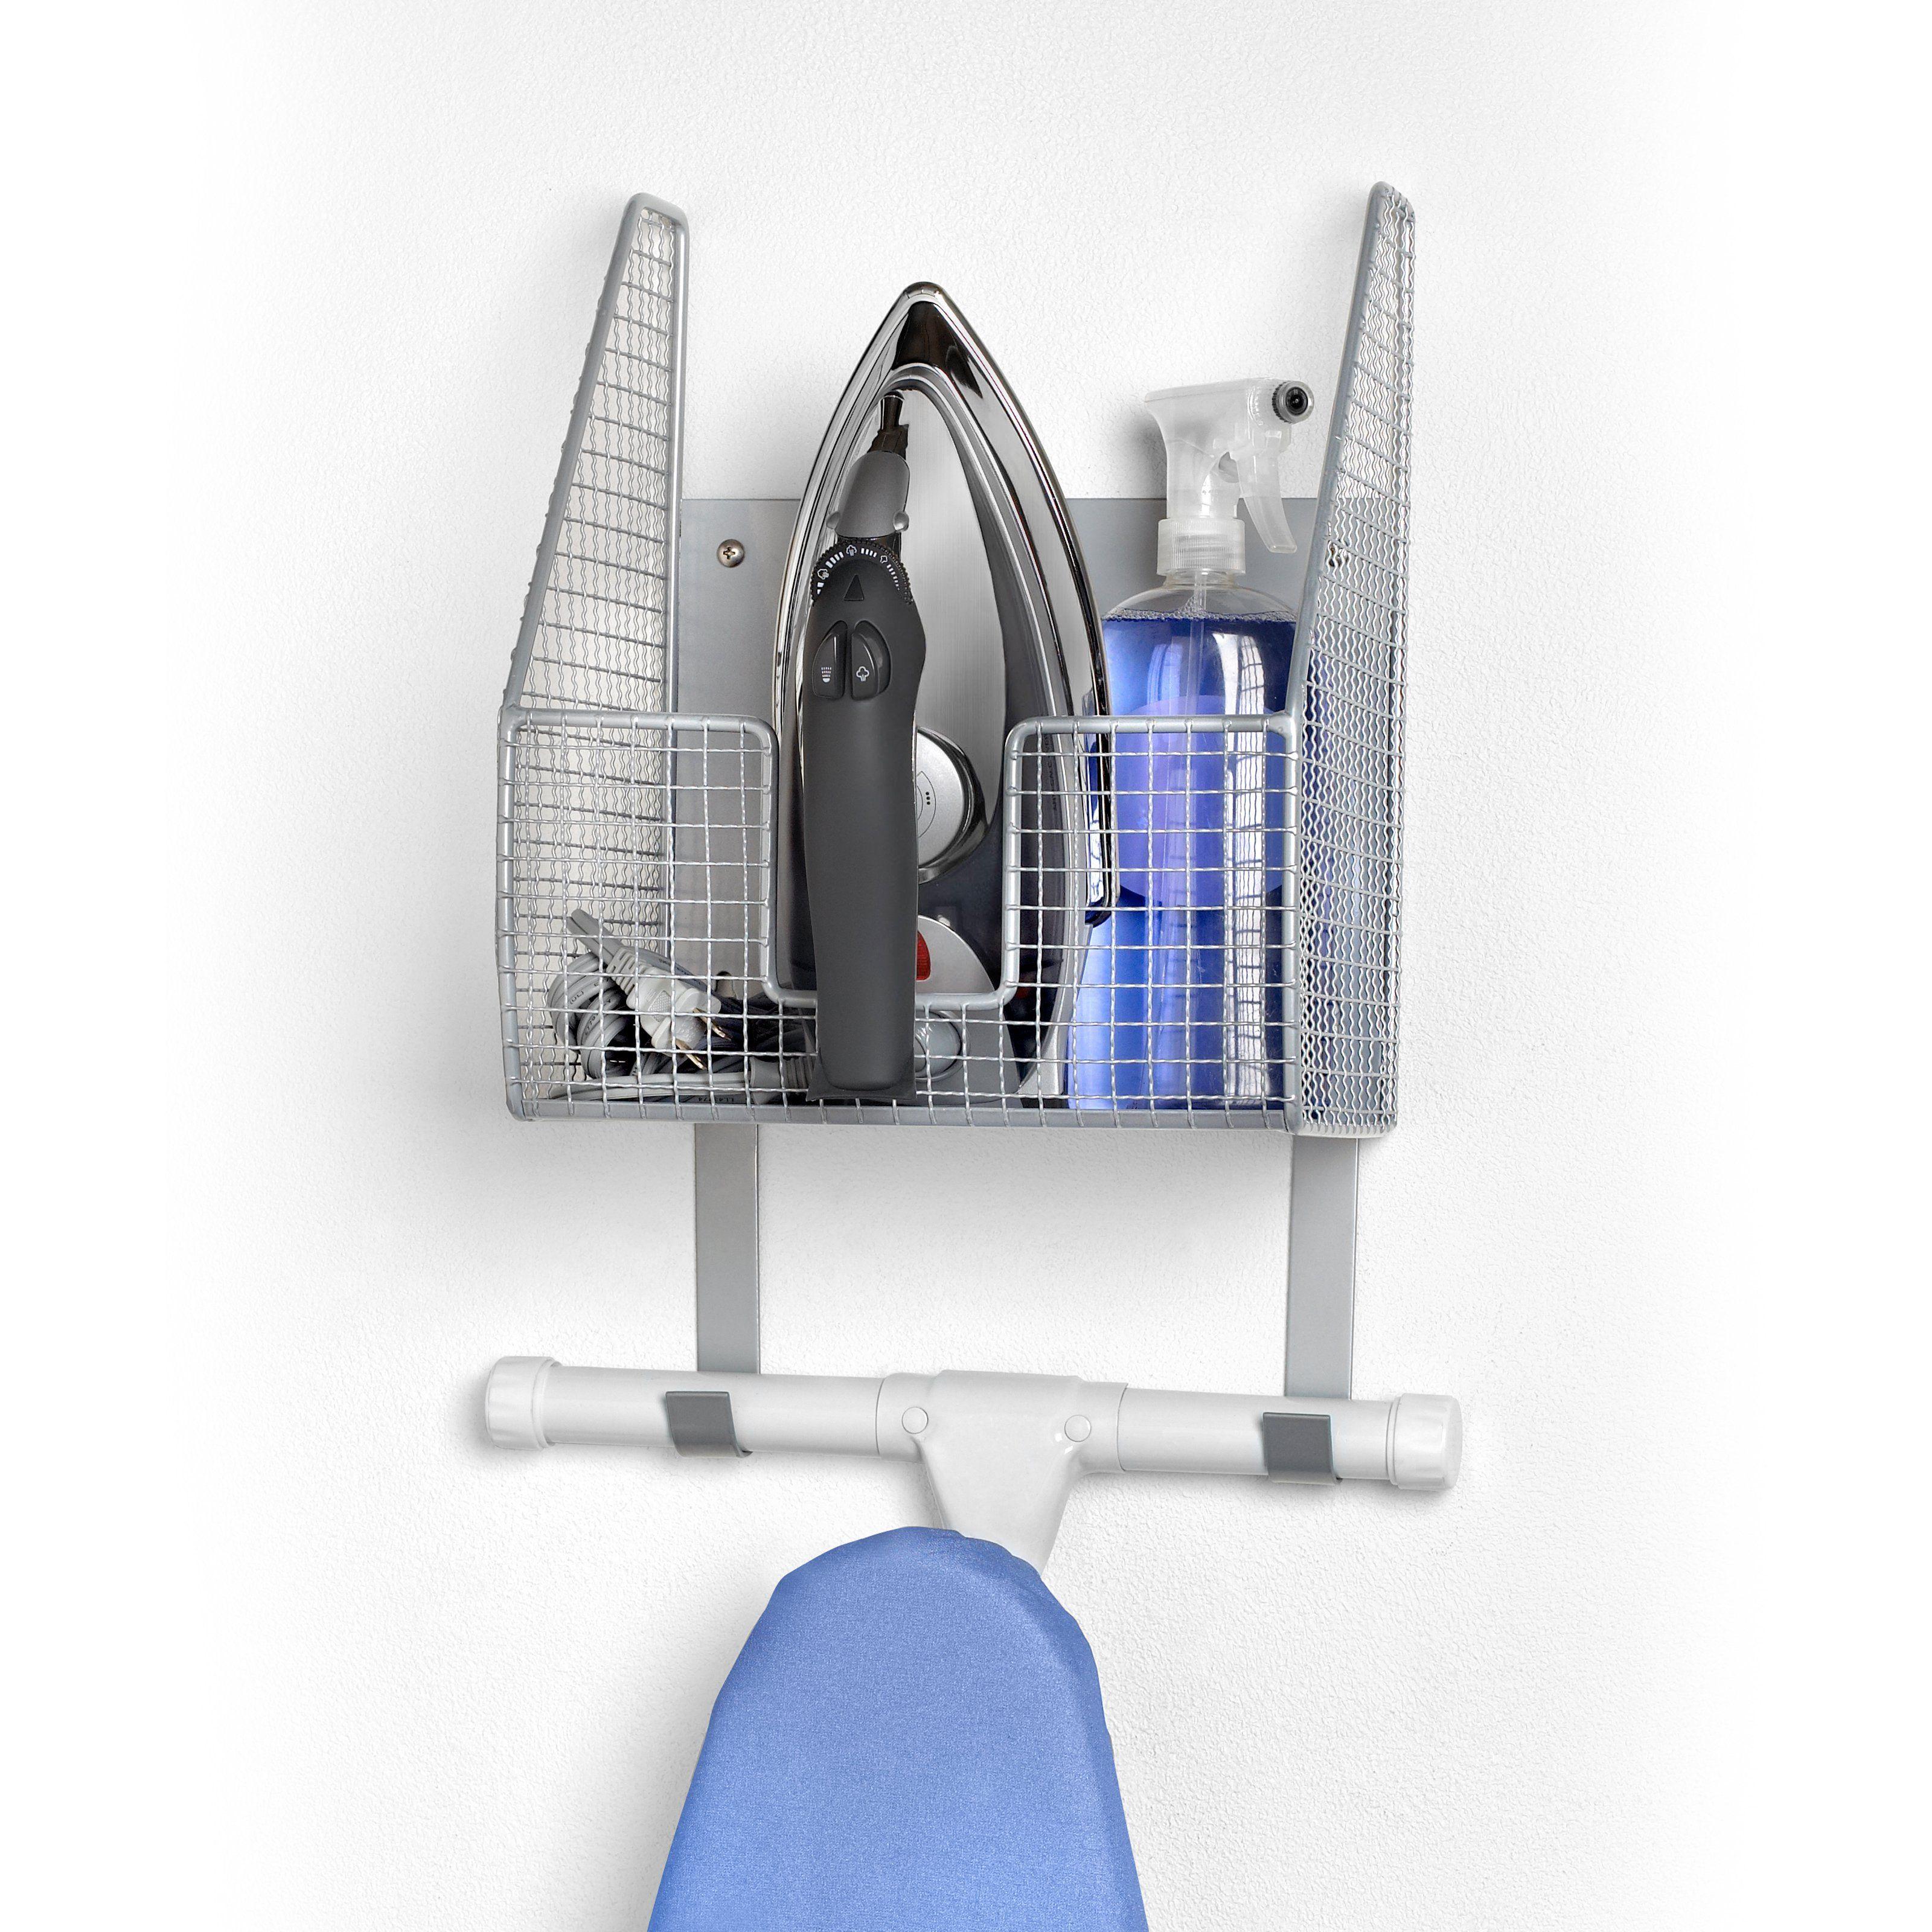 spectrum diversified wall mount single basket with ironing board holder in 2019 hardware. Black Bedroom Furniture Sets. Home Design Ideas